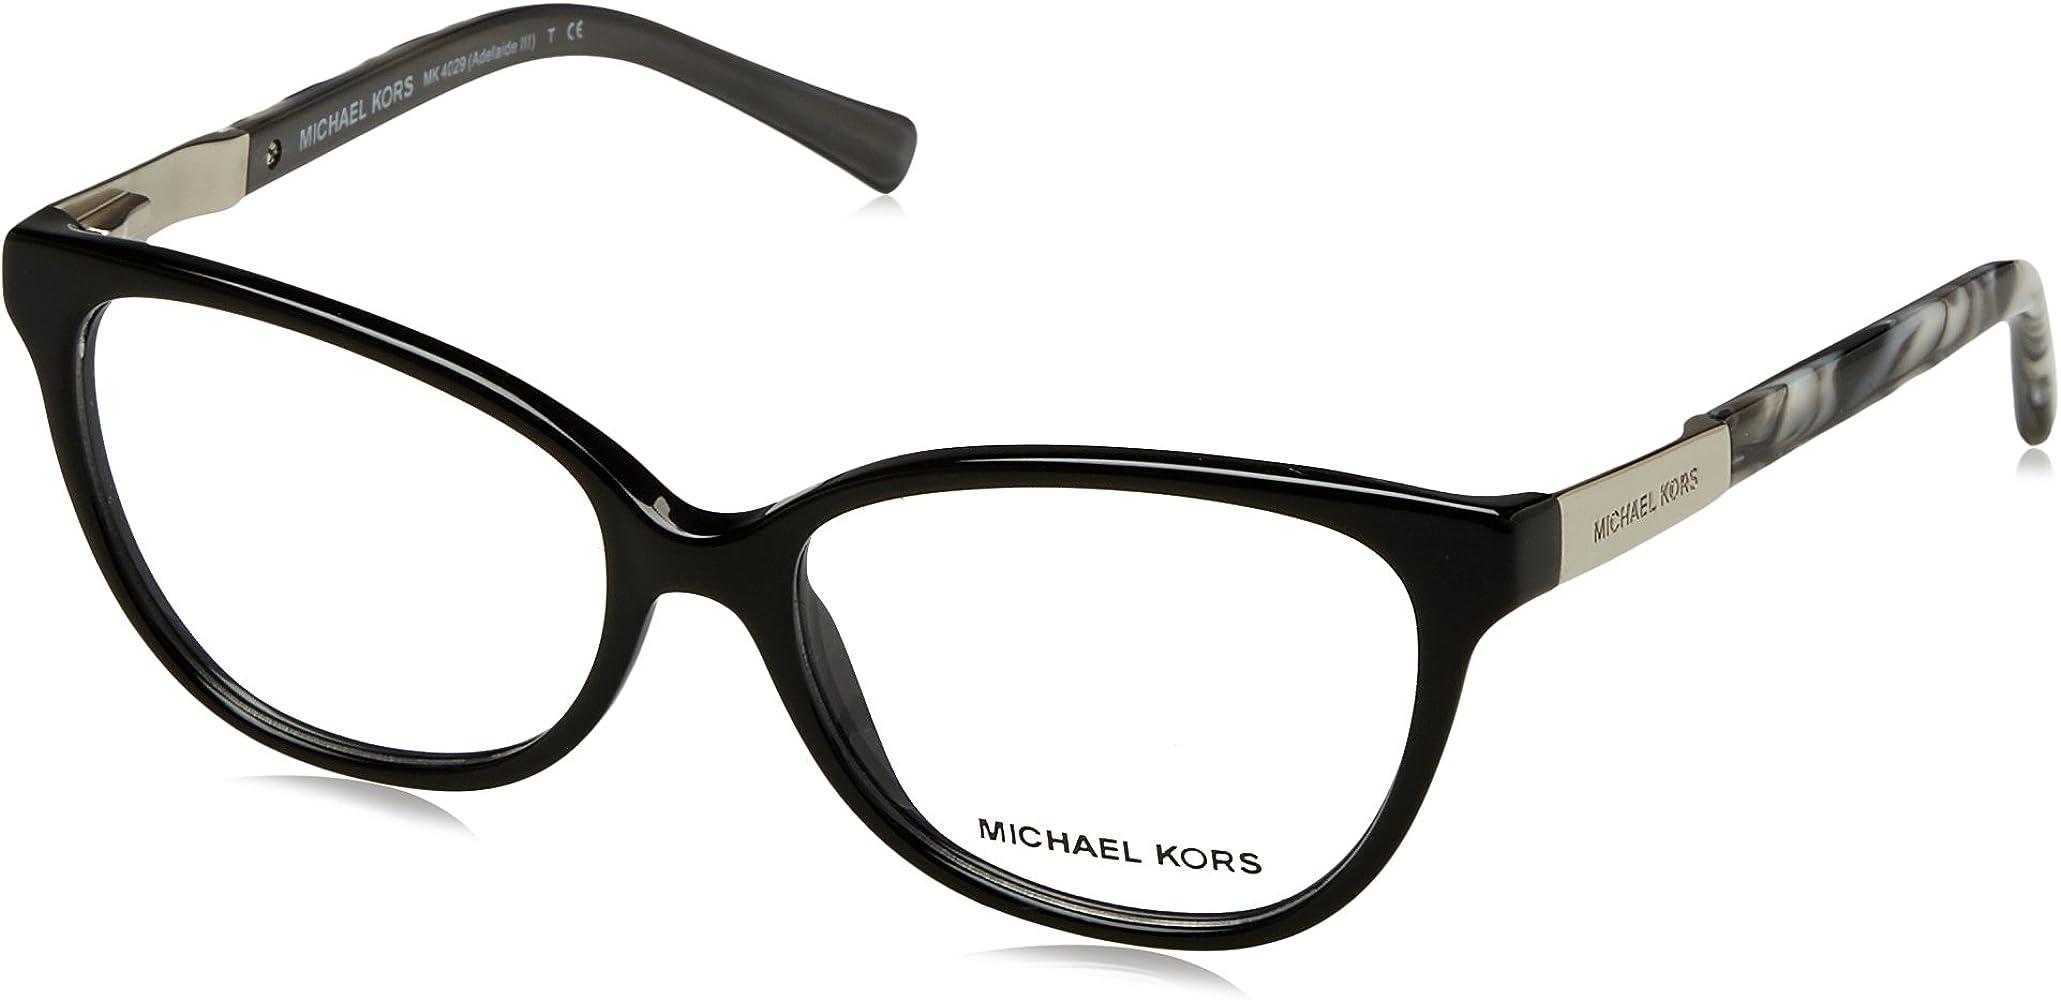 21b804bb826e Michael Kors ADELAIDE III MK4029 Eyeglass Frames 3120-51 - Black Metallic  Black MK4029-